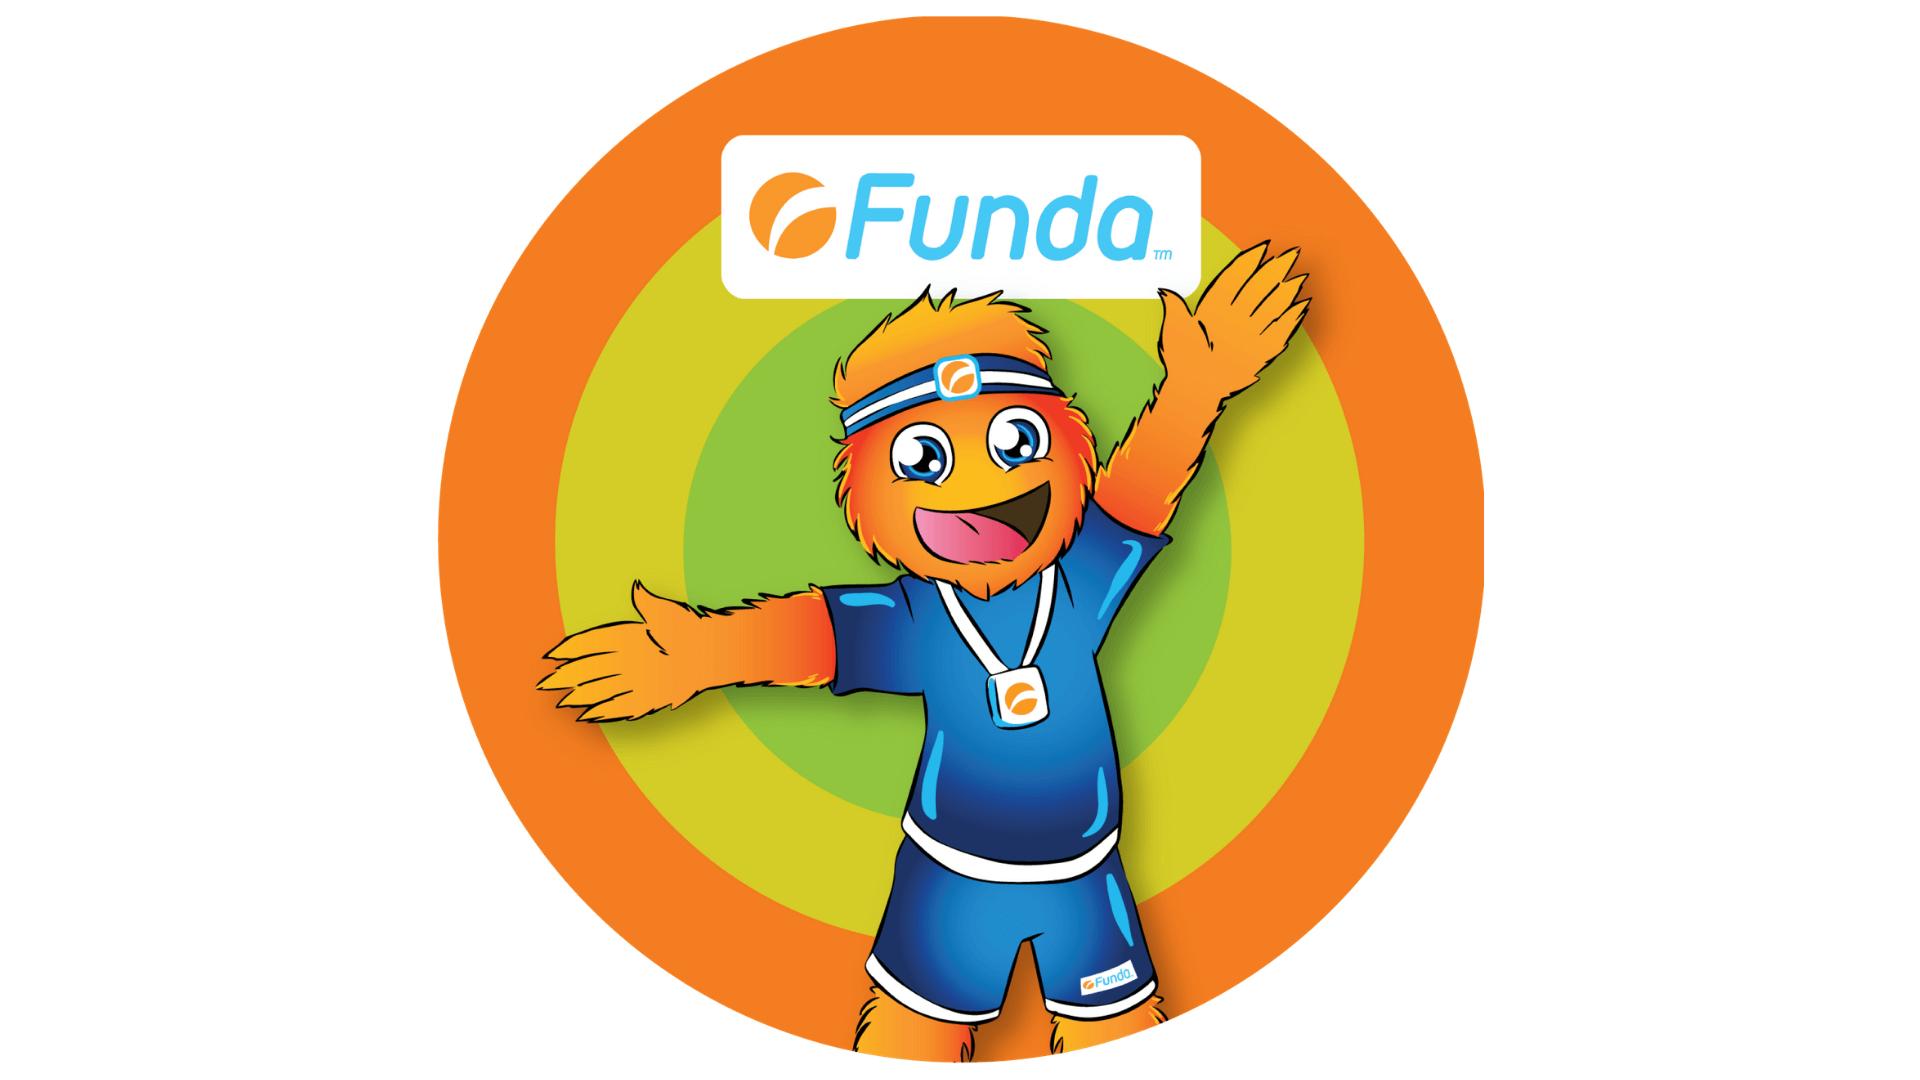 FUNDA Primary School PE, Holiday Camps & Childcare Lancashire